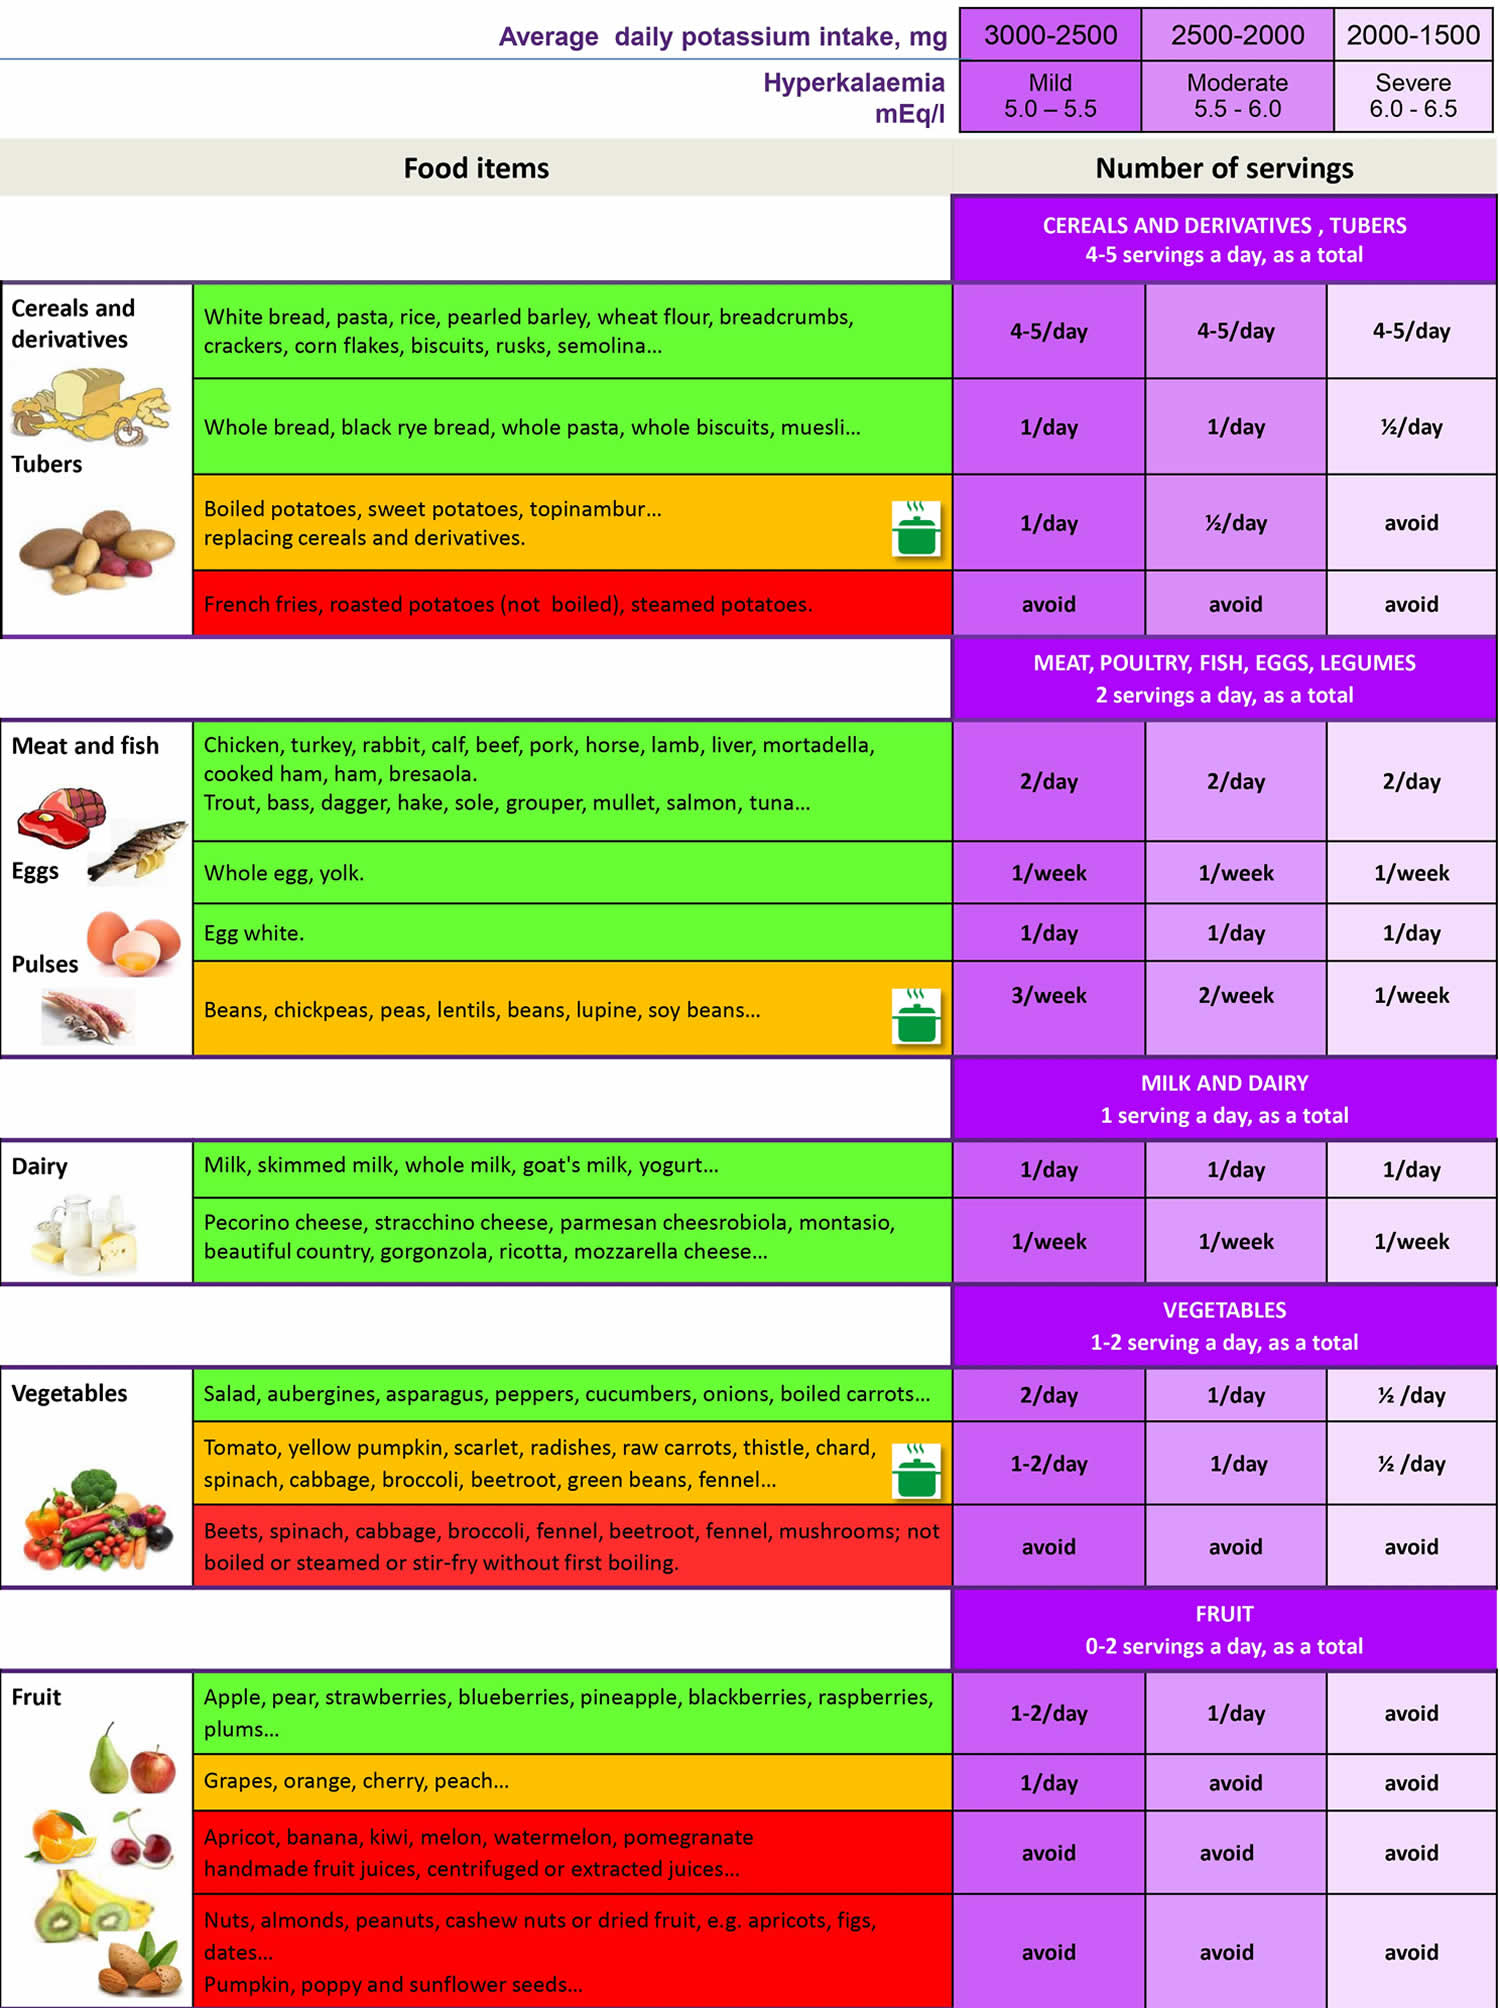 Low potassium foods chart